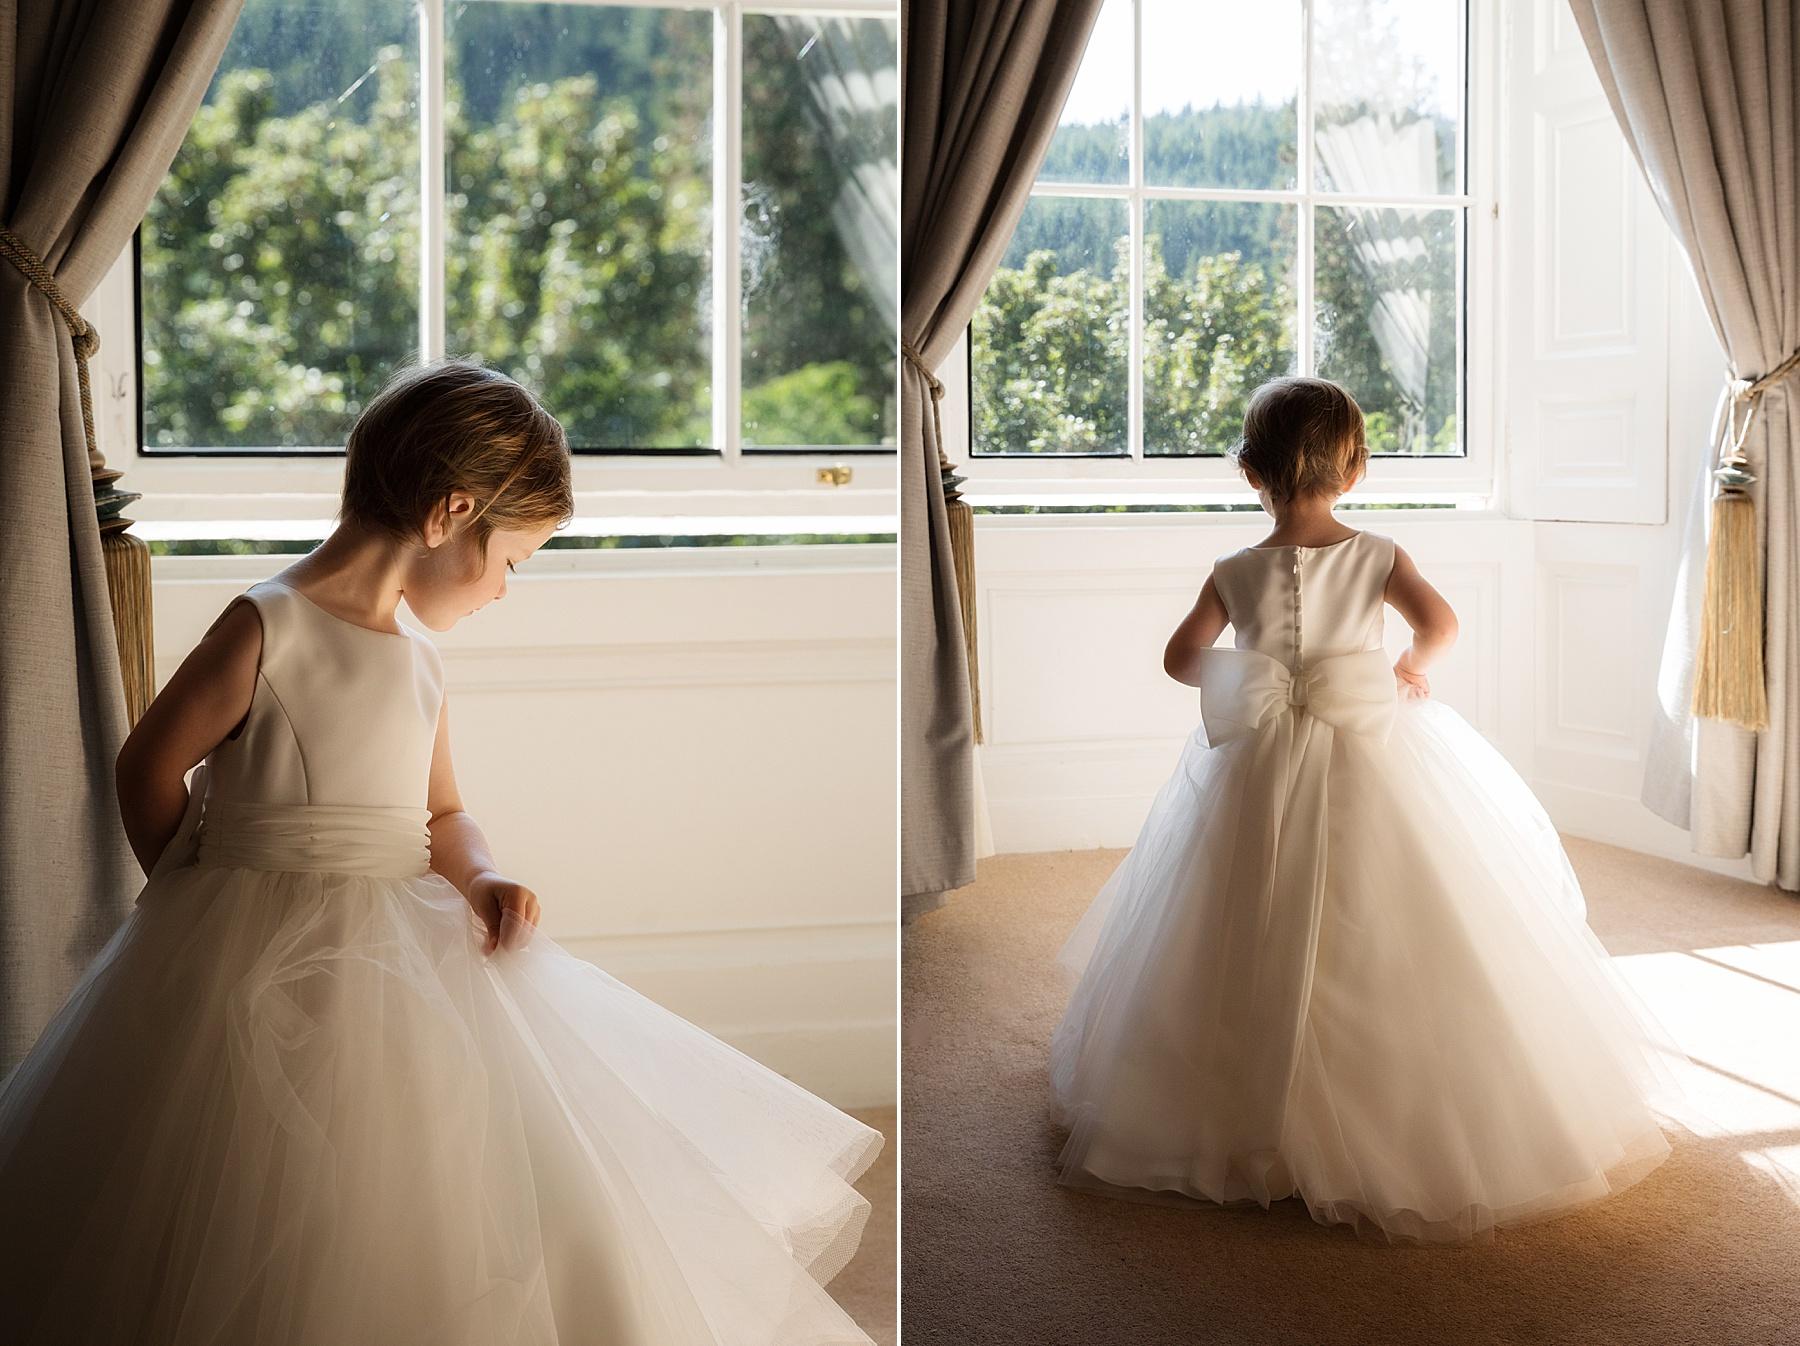 Drumtochty castle wedding